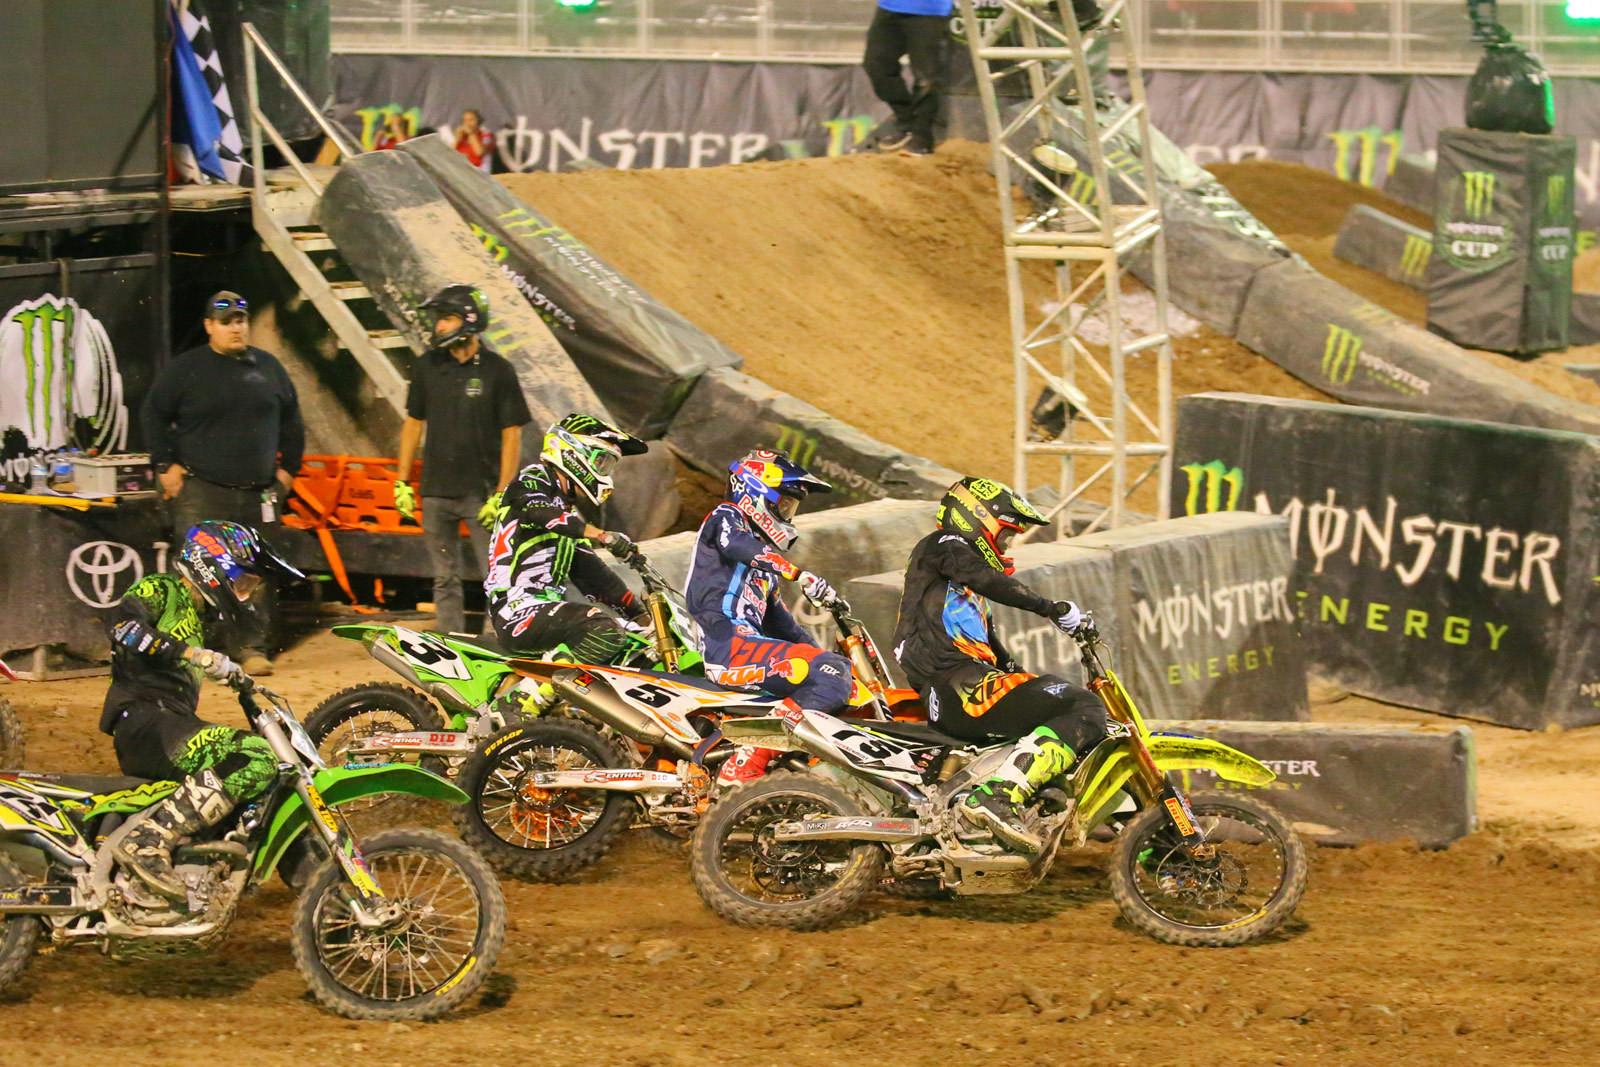 Nick Schmidt, Ryan Dungey, Eli Tomac - Photo Blast: Monster Energy Cup - Motocross Pictures - Vital MX